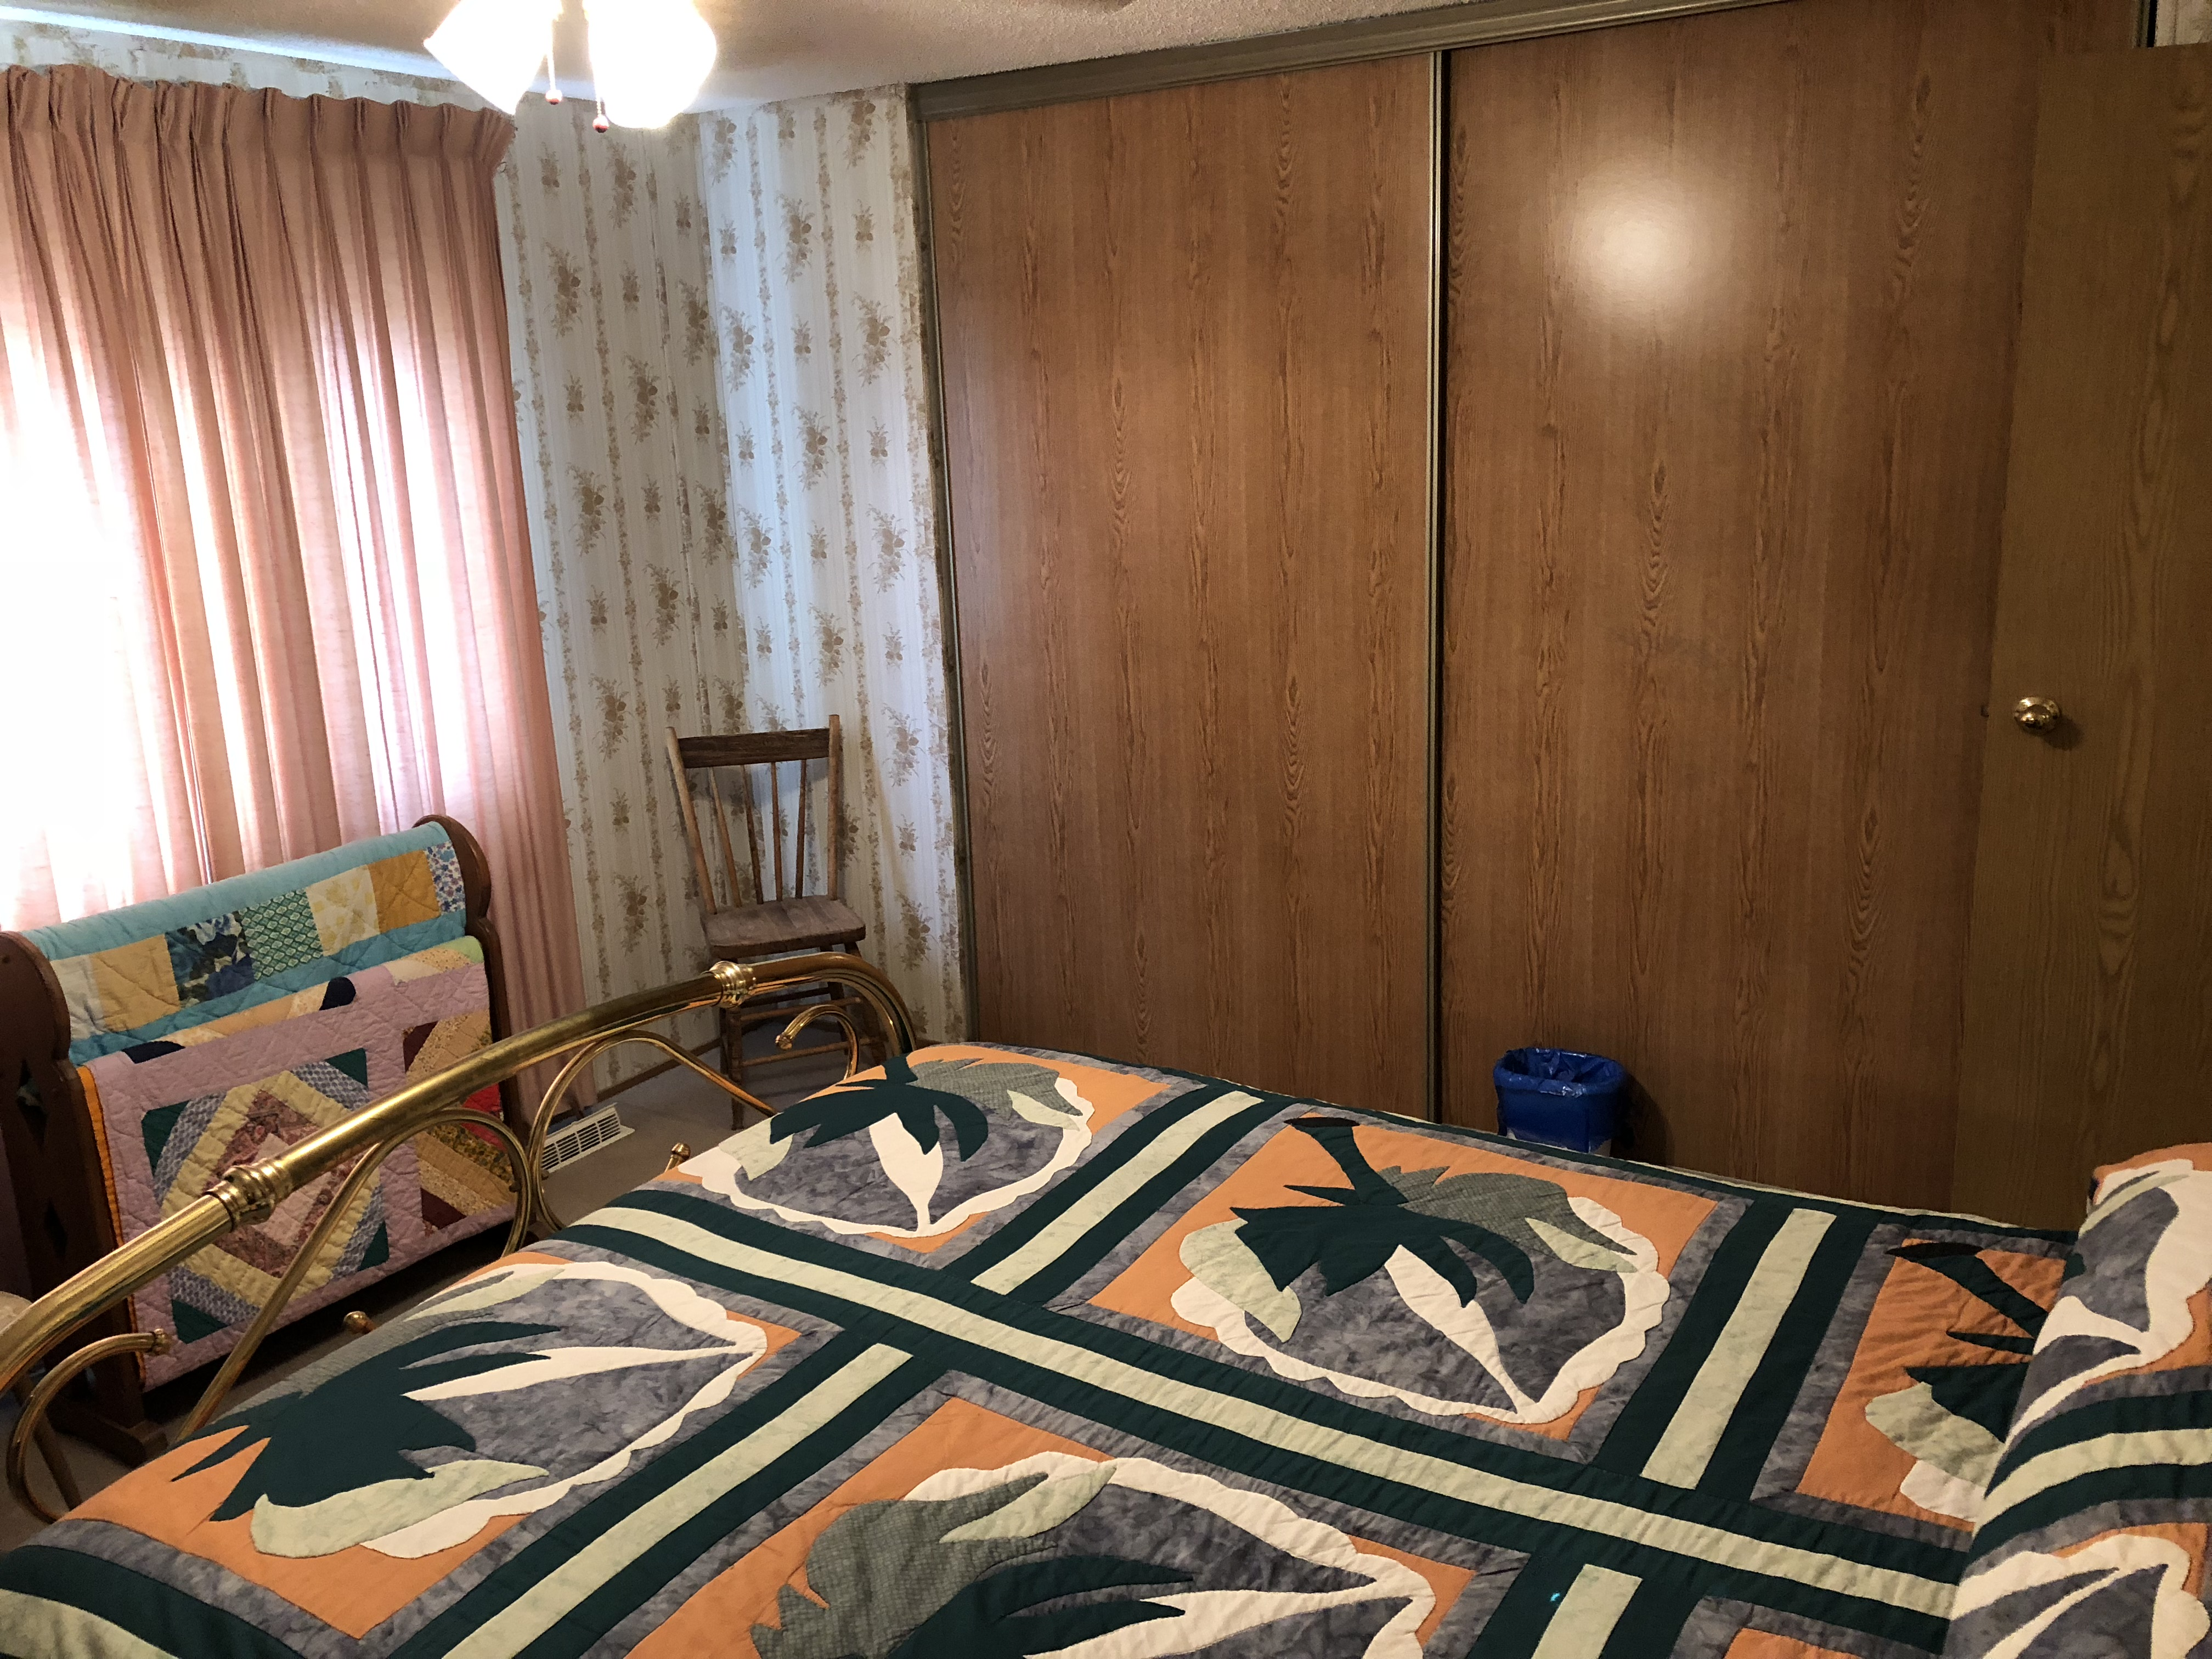 KP master bedroom closet